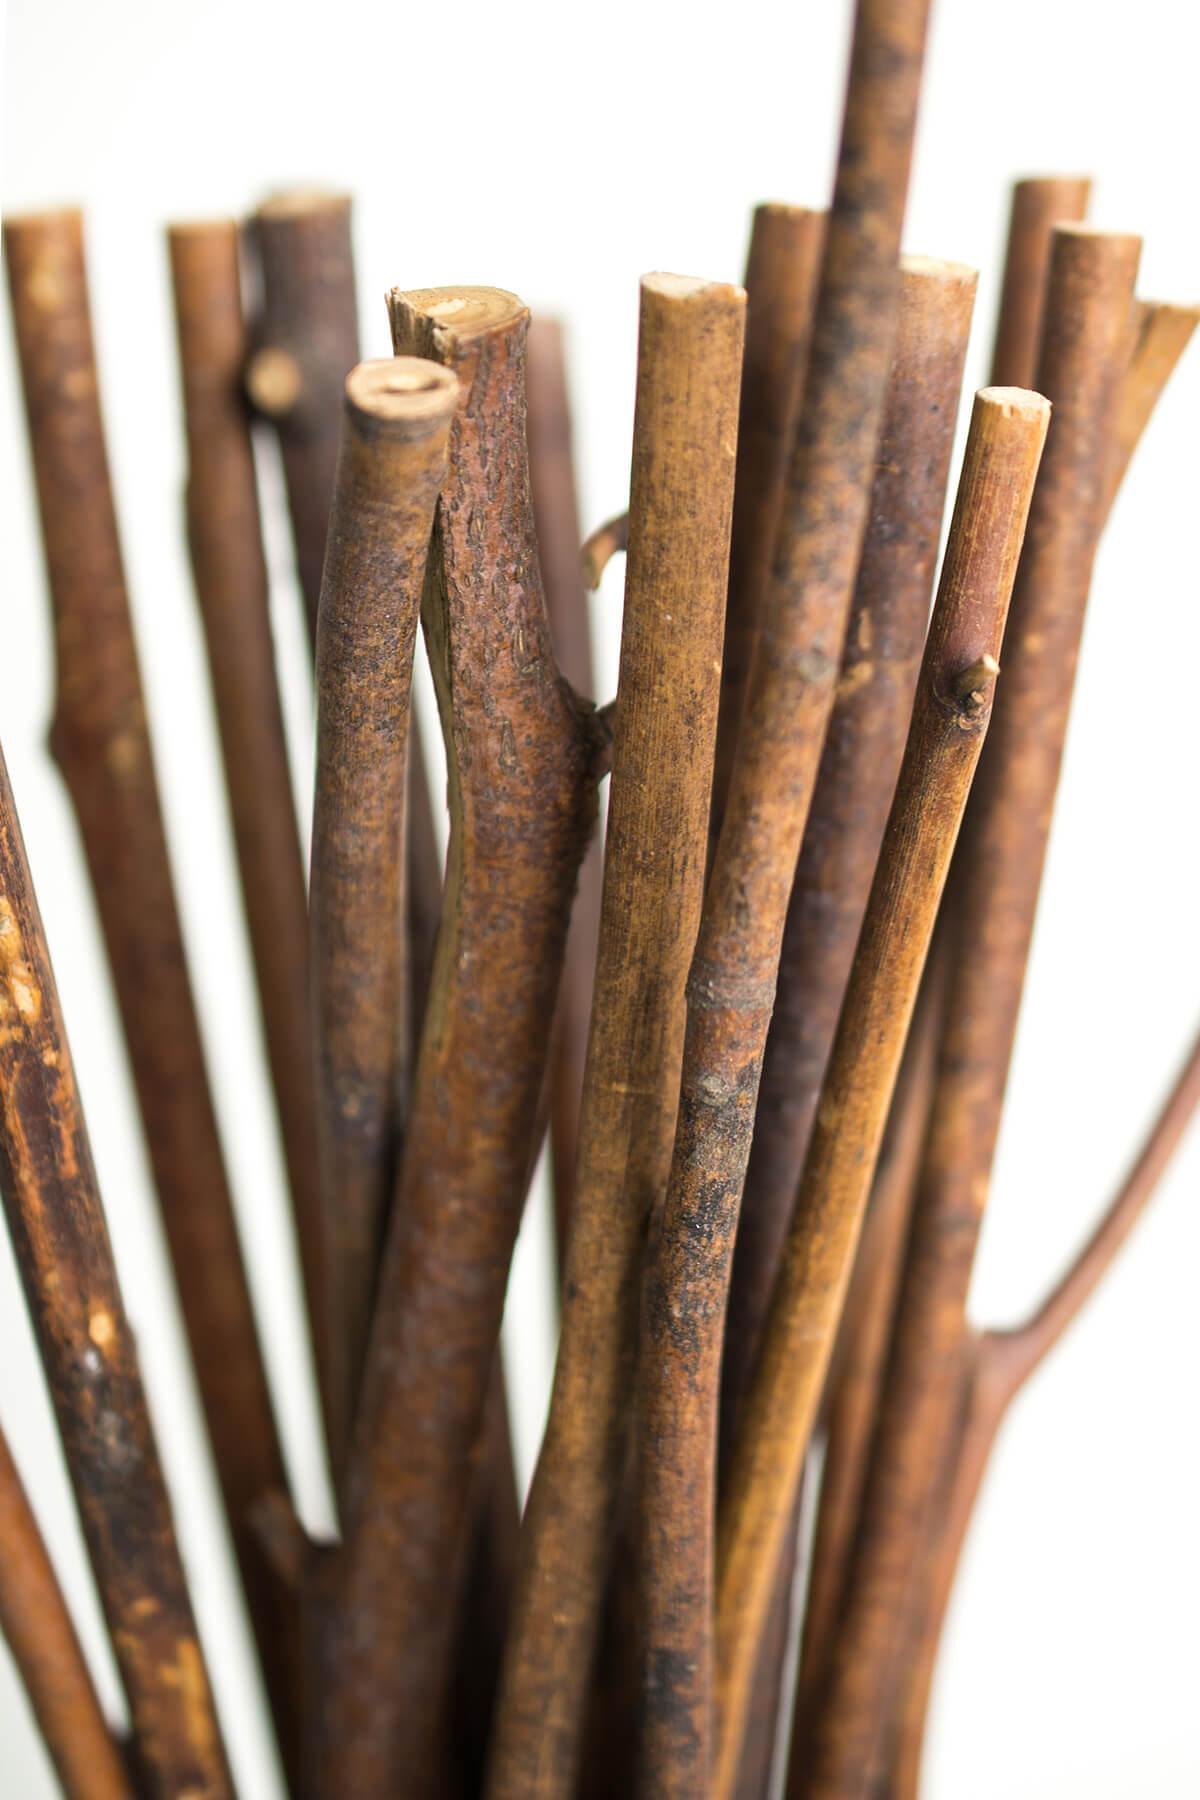 Bundle of Wood Sticks 13in 1.5lbs